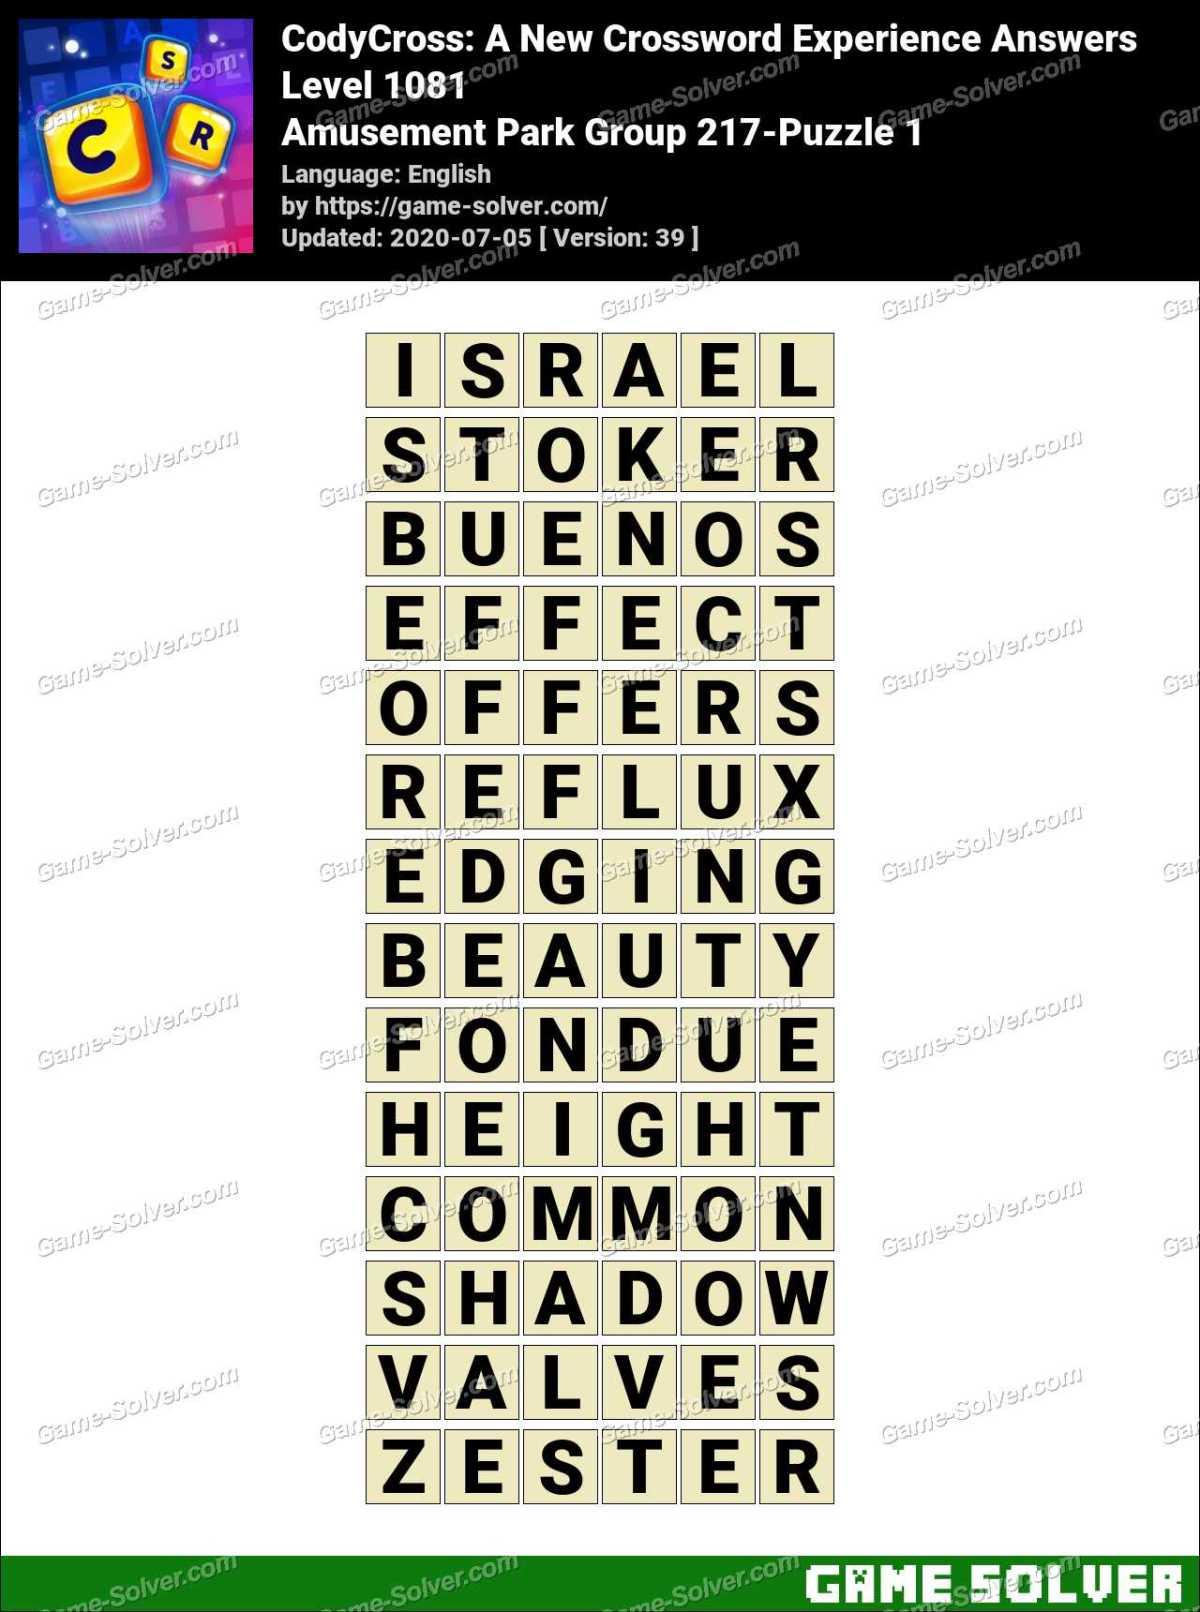 CodyCross Amusement Park Group 217-Puzzle 1 Answers